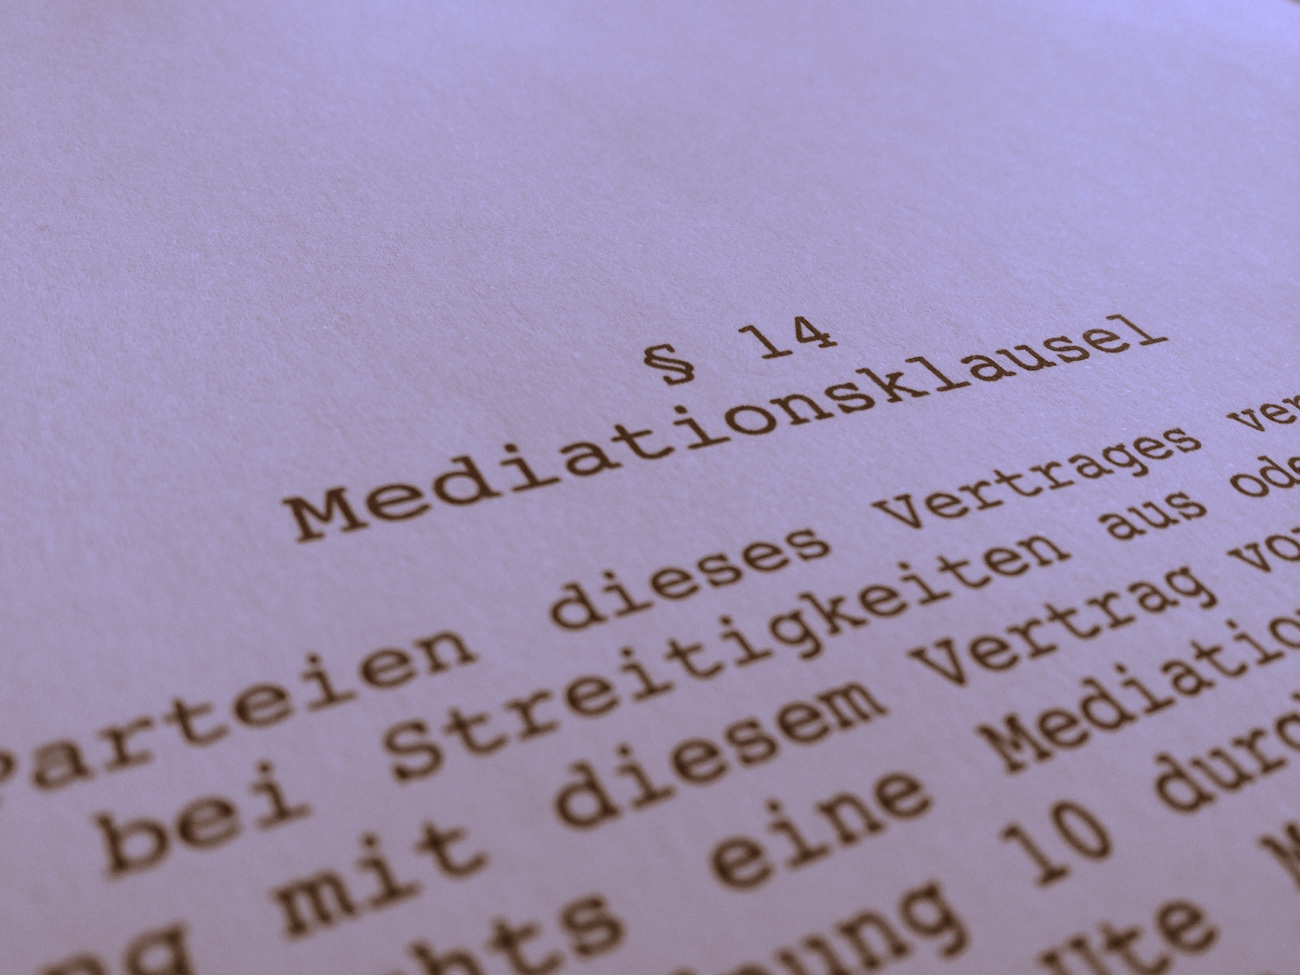 Mediationsklausel Praxisnahe Musterklausel Für Verträge